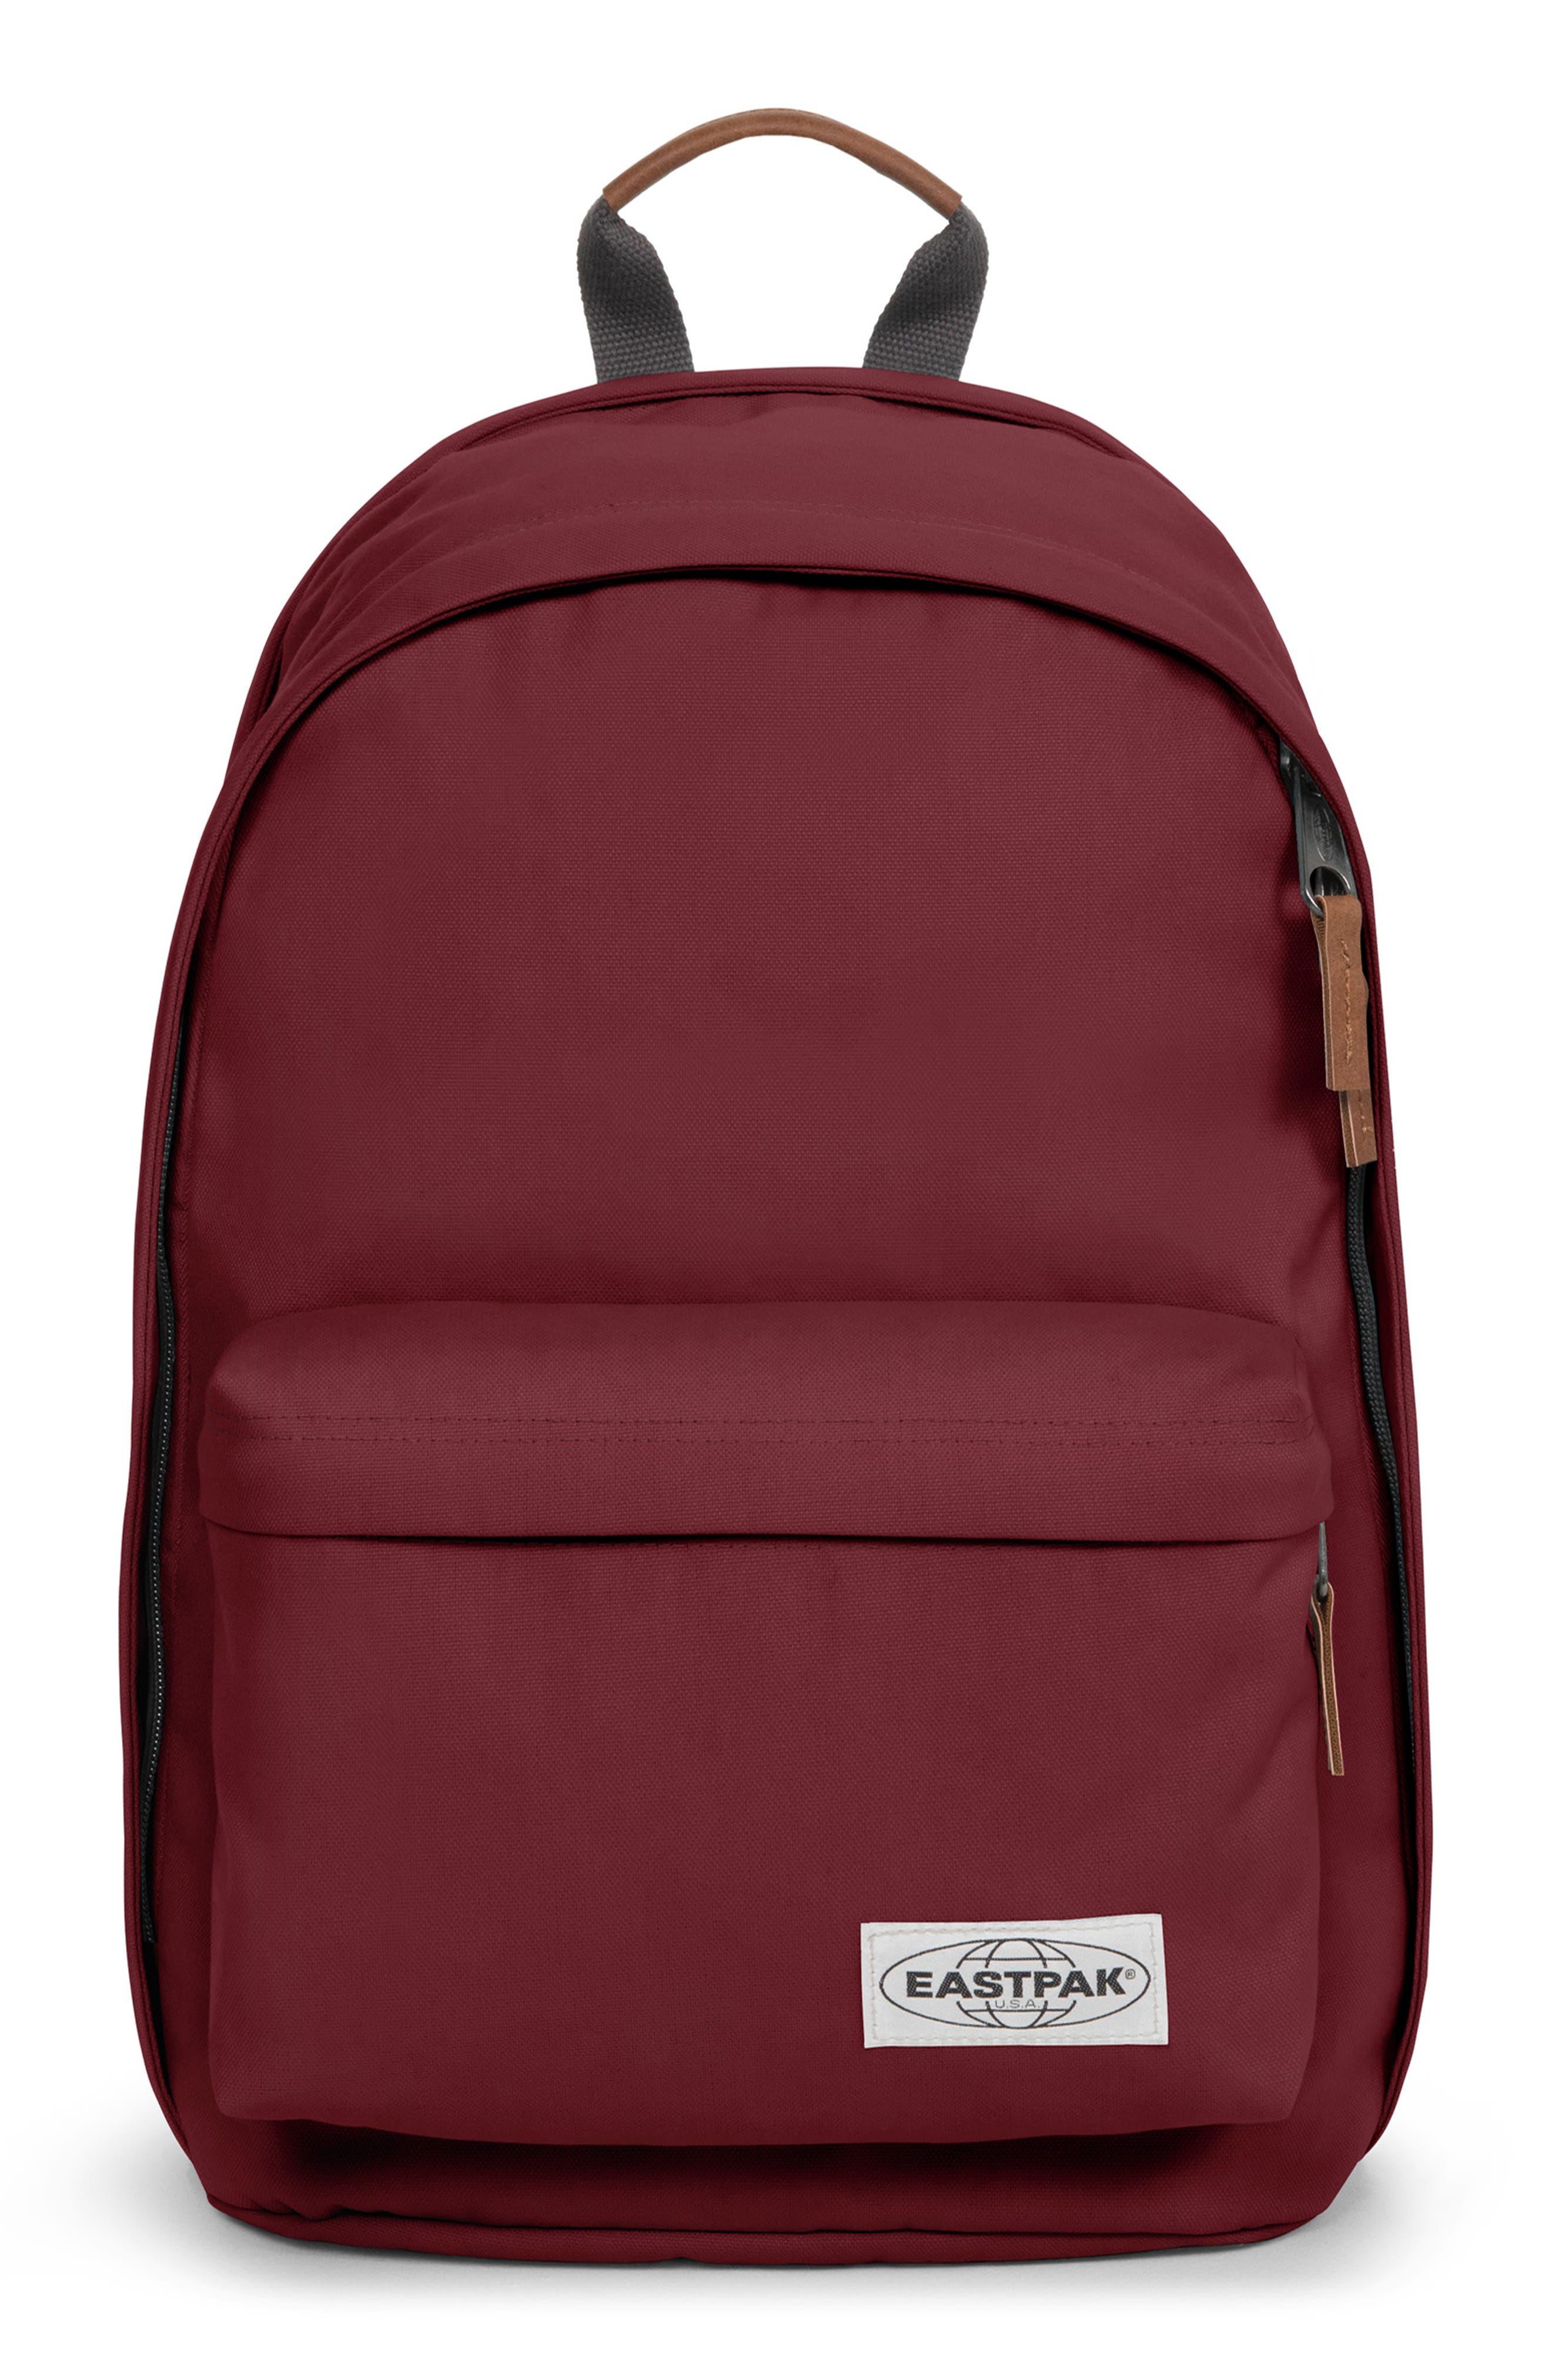 Eastpak Back To Work Backpack - Purple